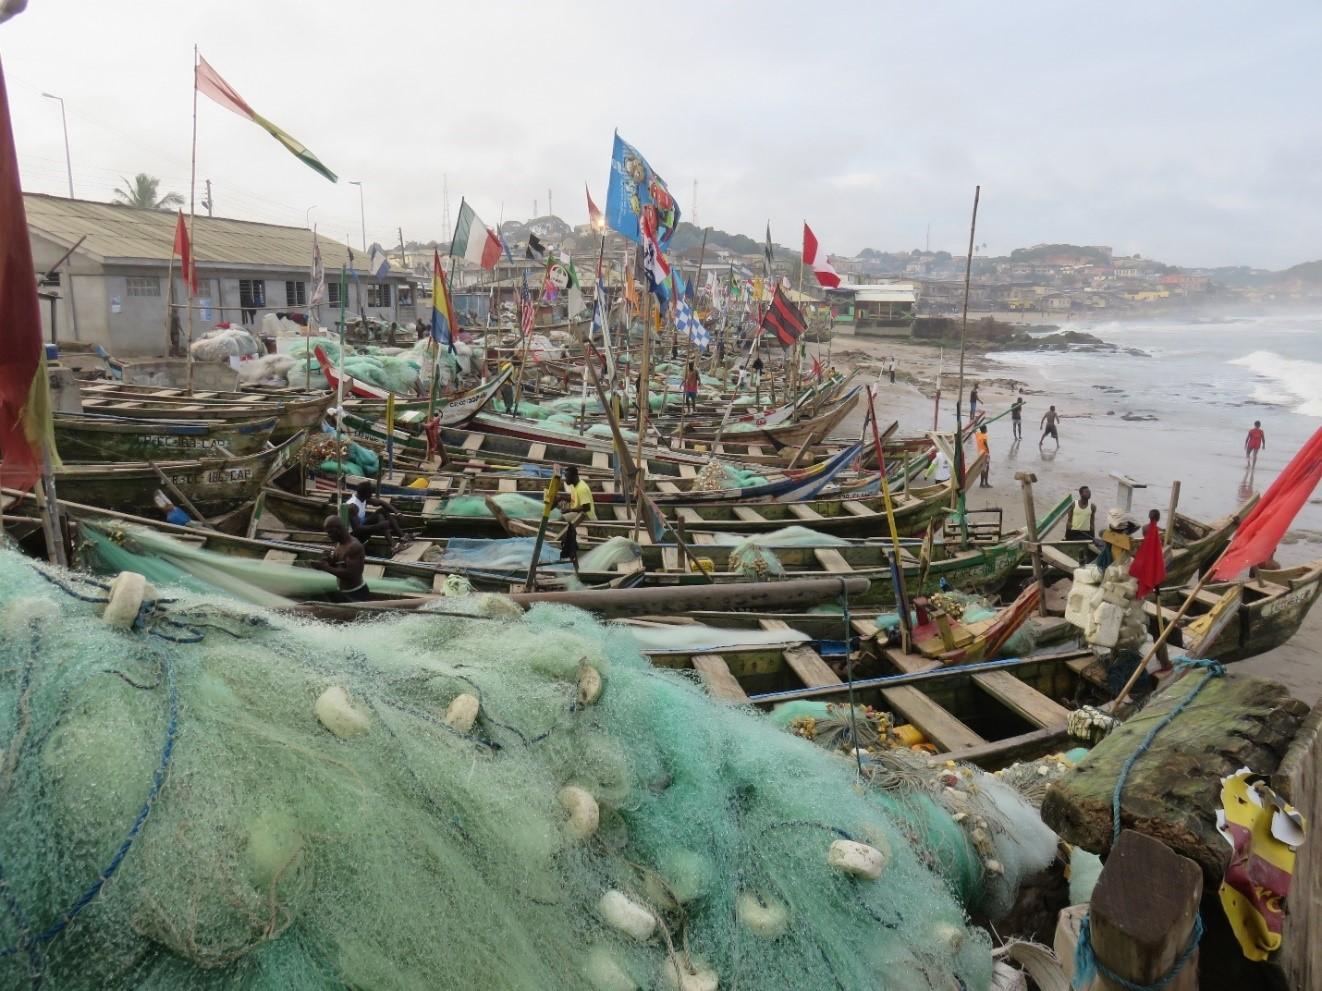 Fishermen mending their nets in the seaside town of Cape Coast, Ghana.